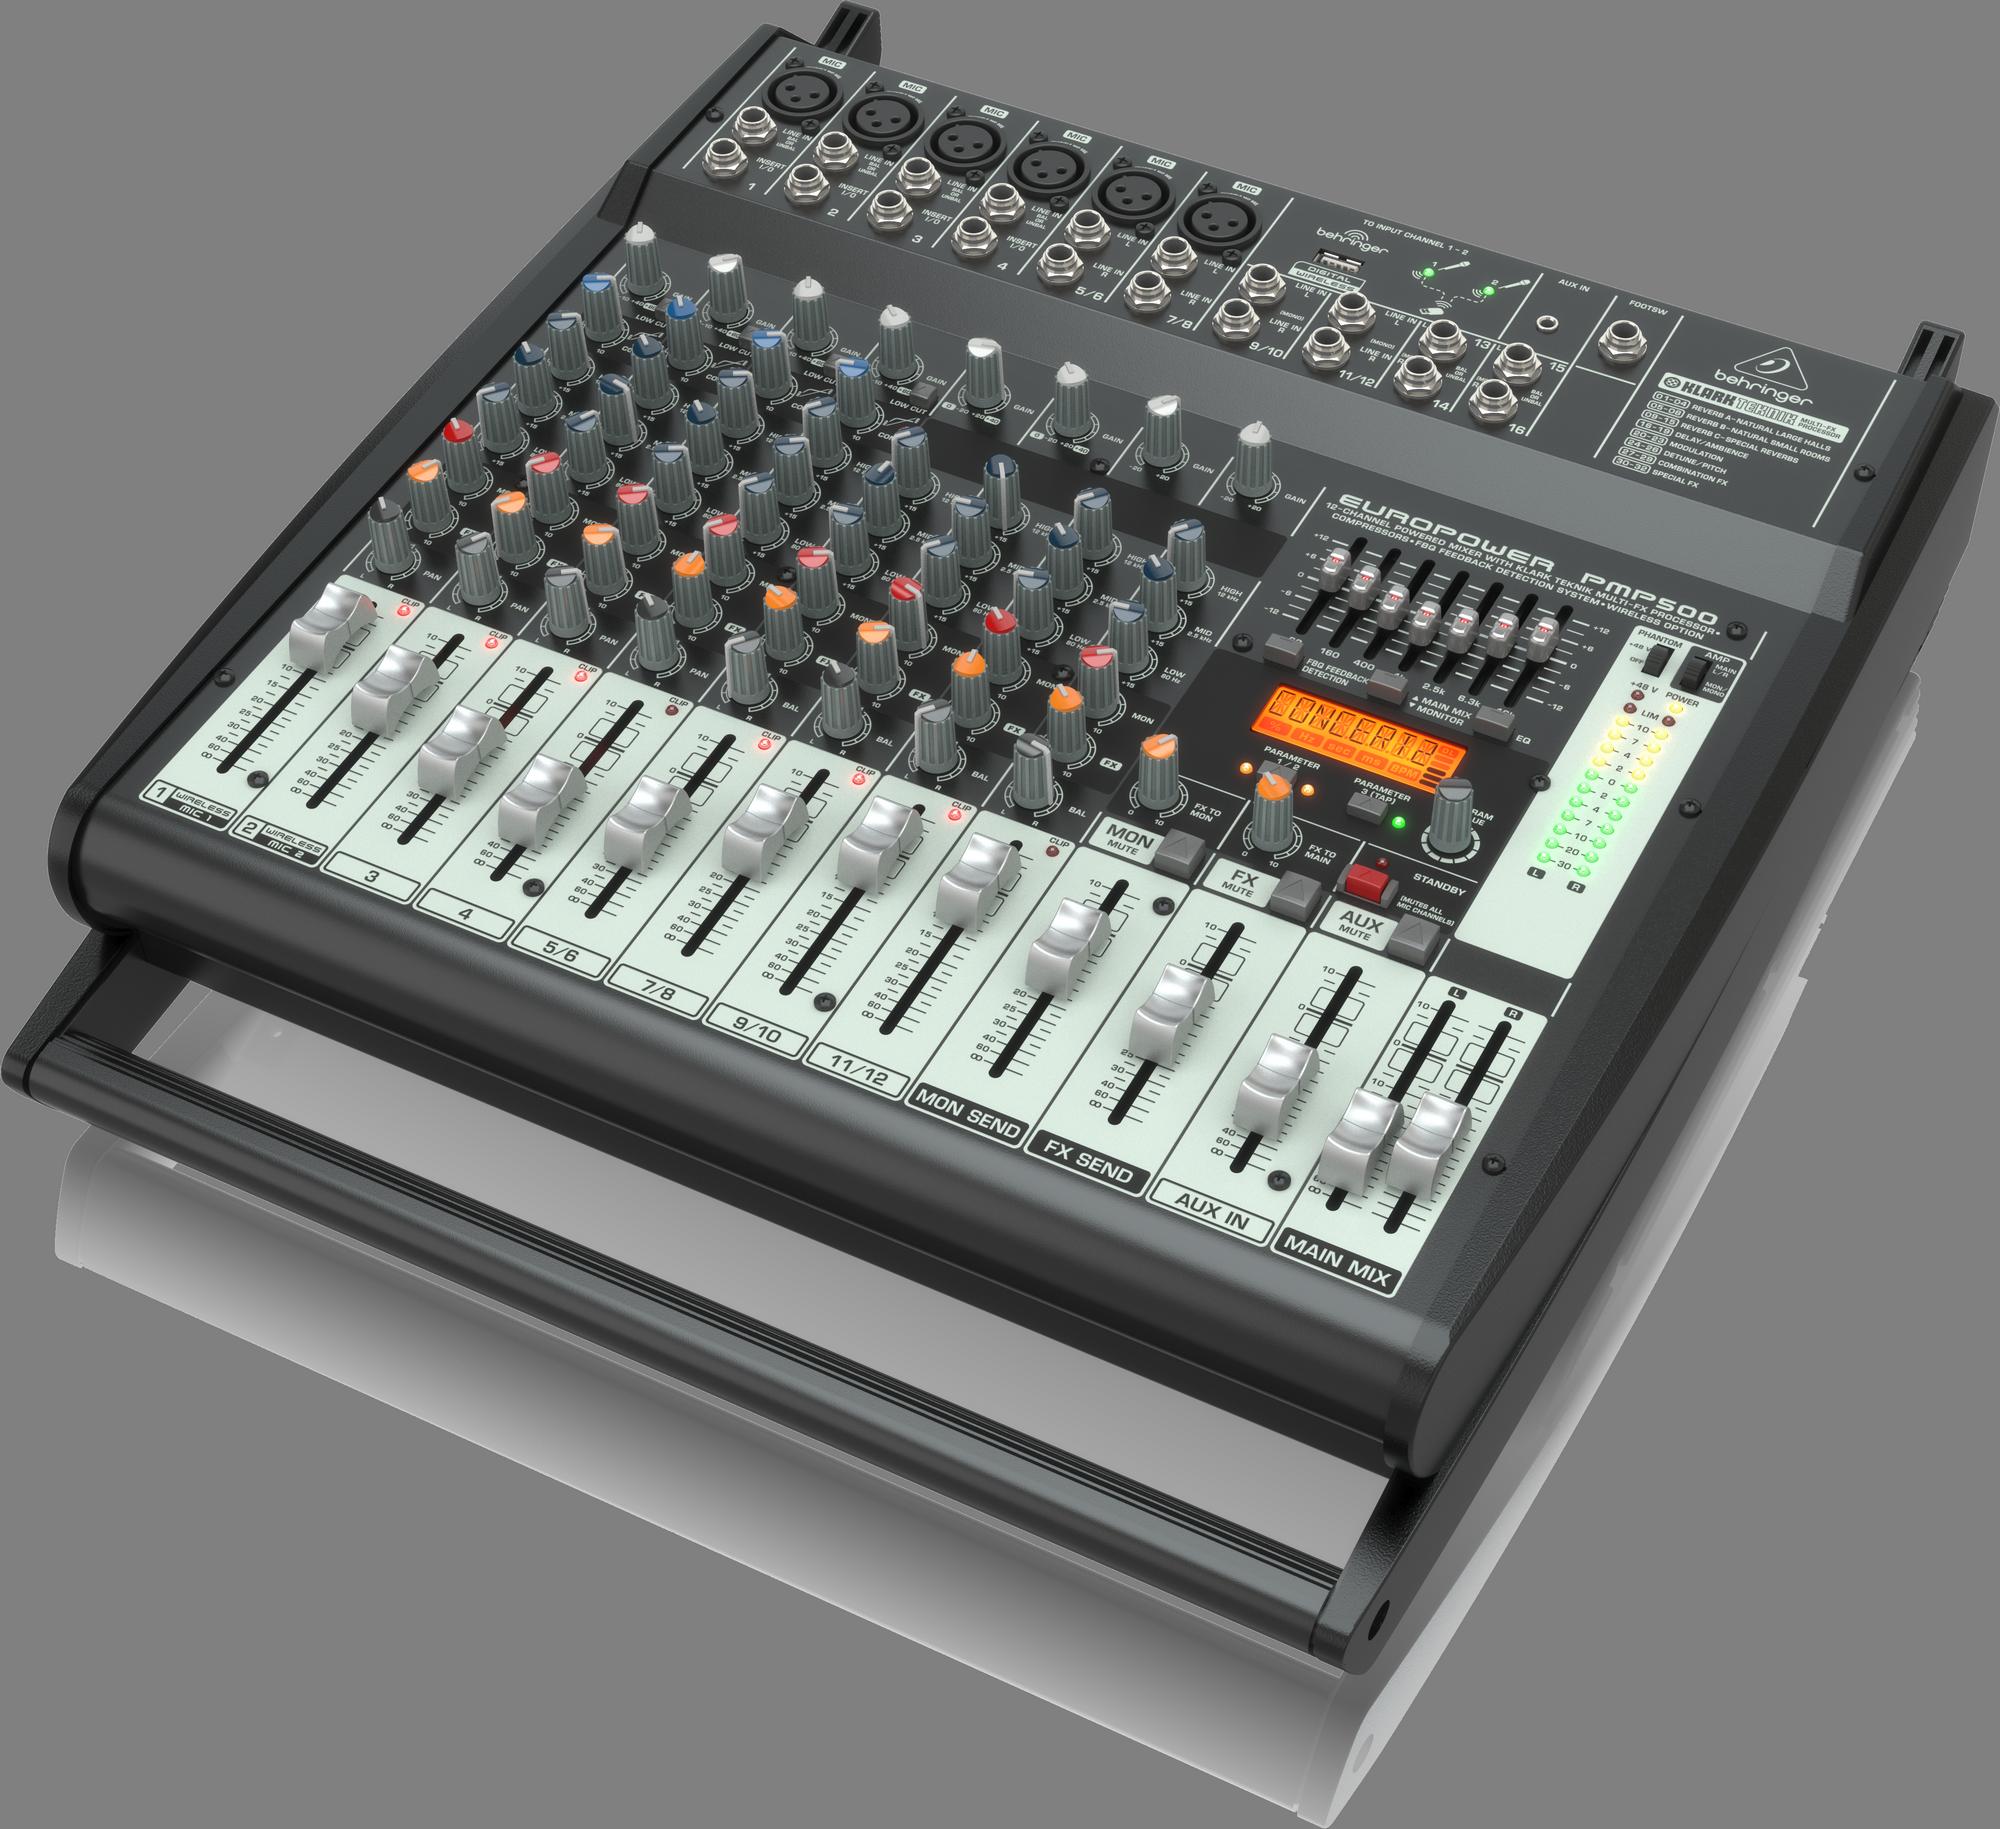 Behringer PMP500 Console